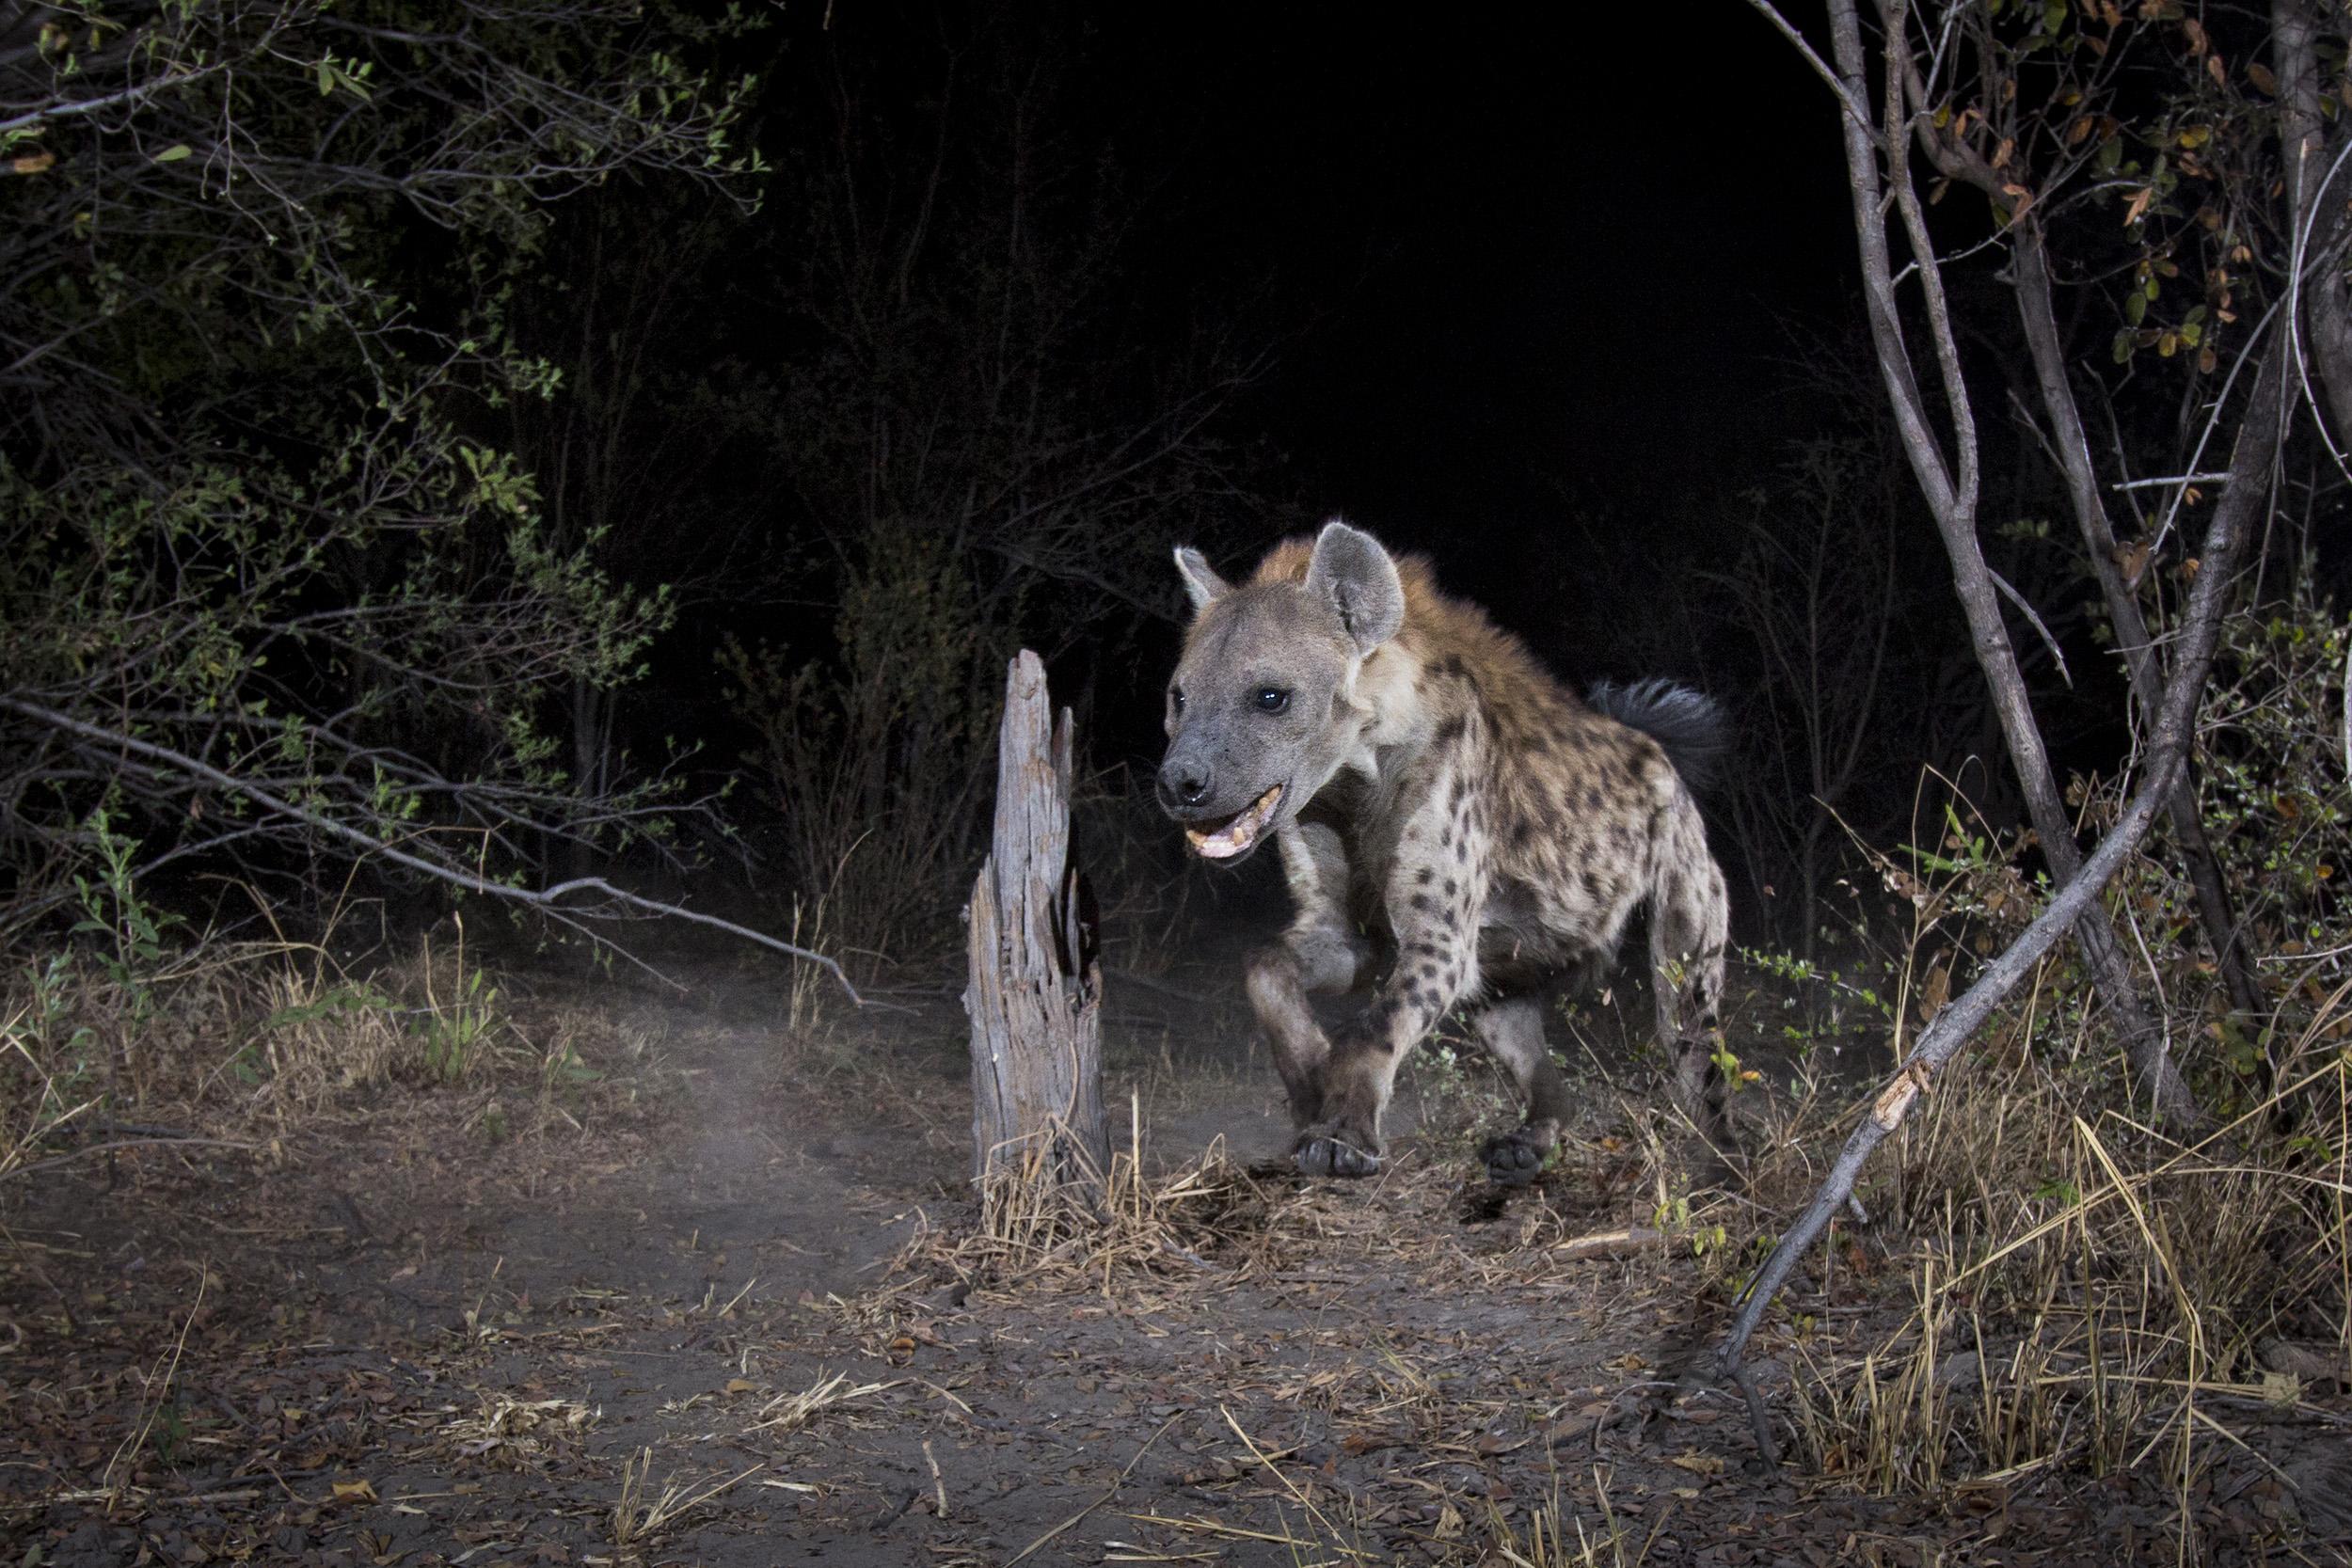 A camera trap image of a hyena using Camtraptions PIR motion sensor.